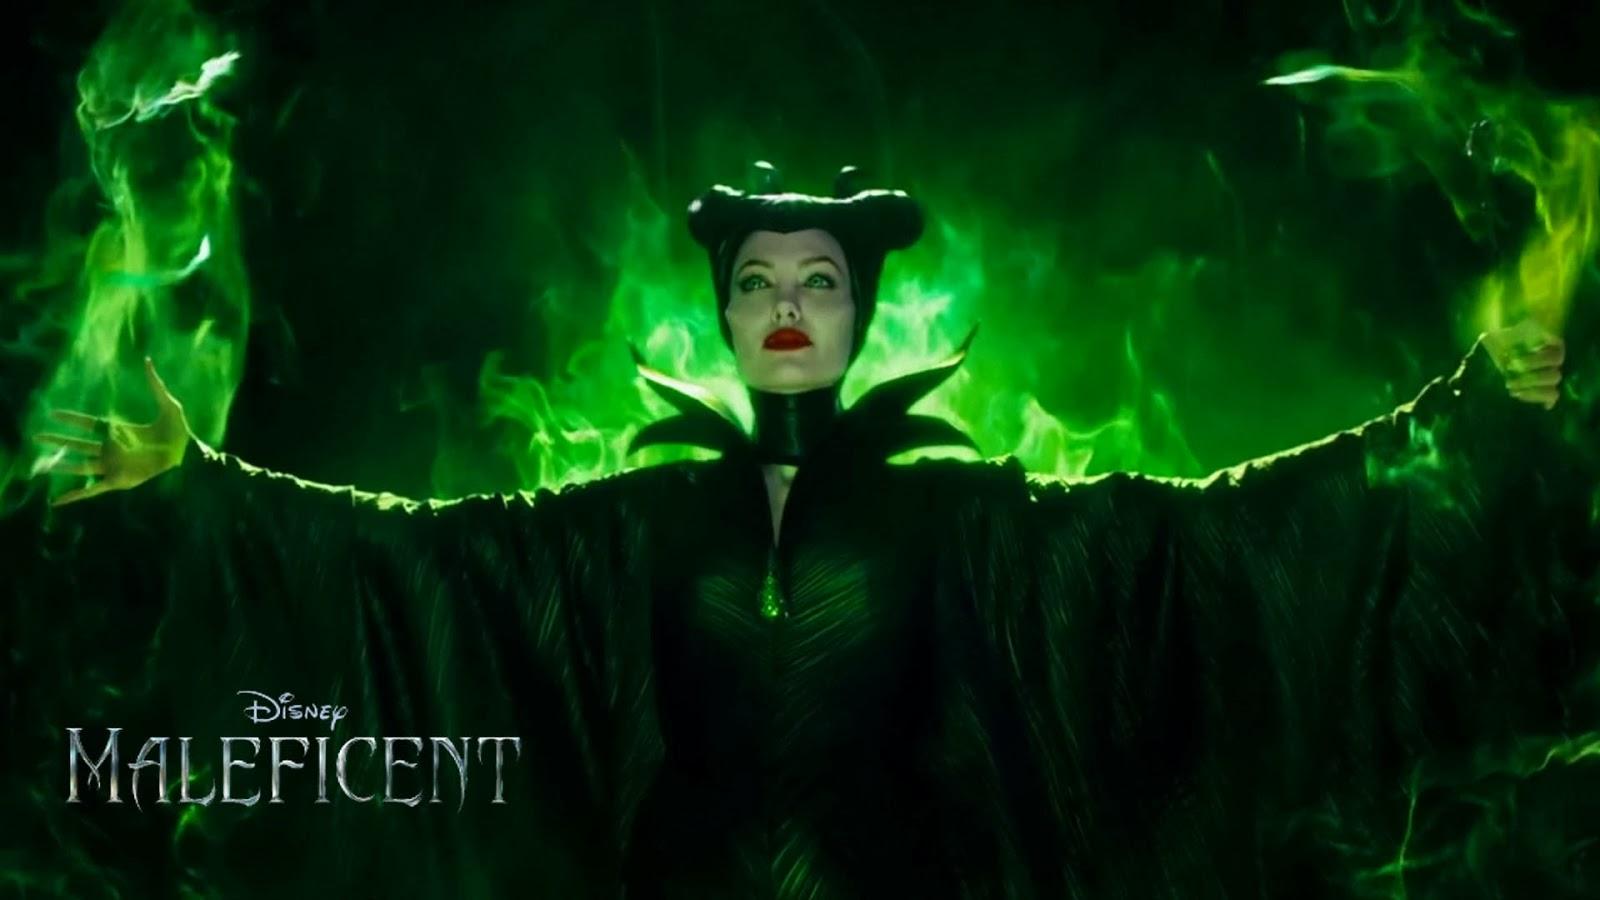 Maleficent (2014) - Movies Maniac1600 x 900